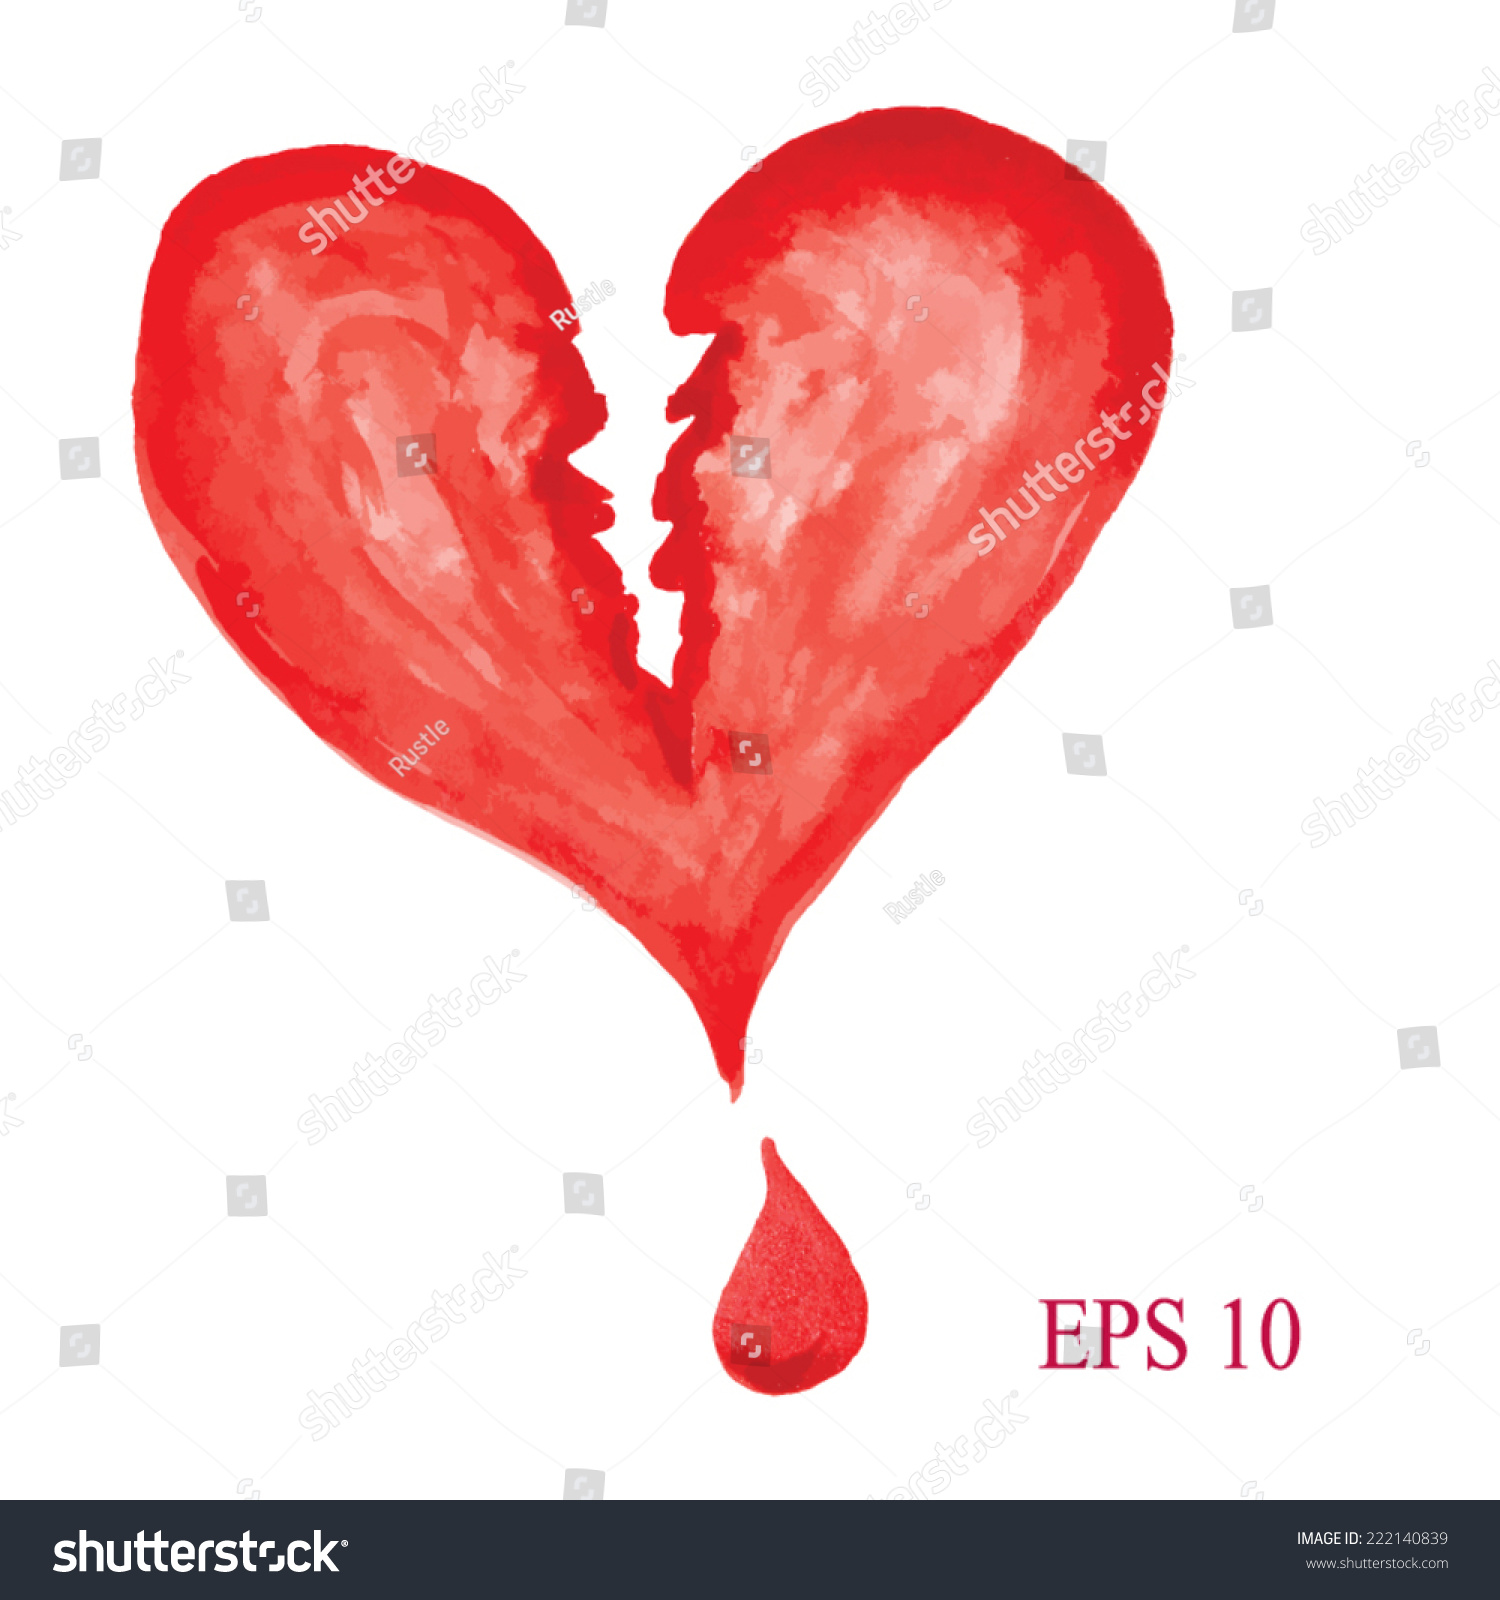 Watercolor heart symbol broken heart handdrawn stock vector watercolor heart symbol of broken heart hand drawn painted red heart vector buycottarizona